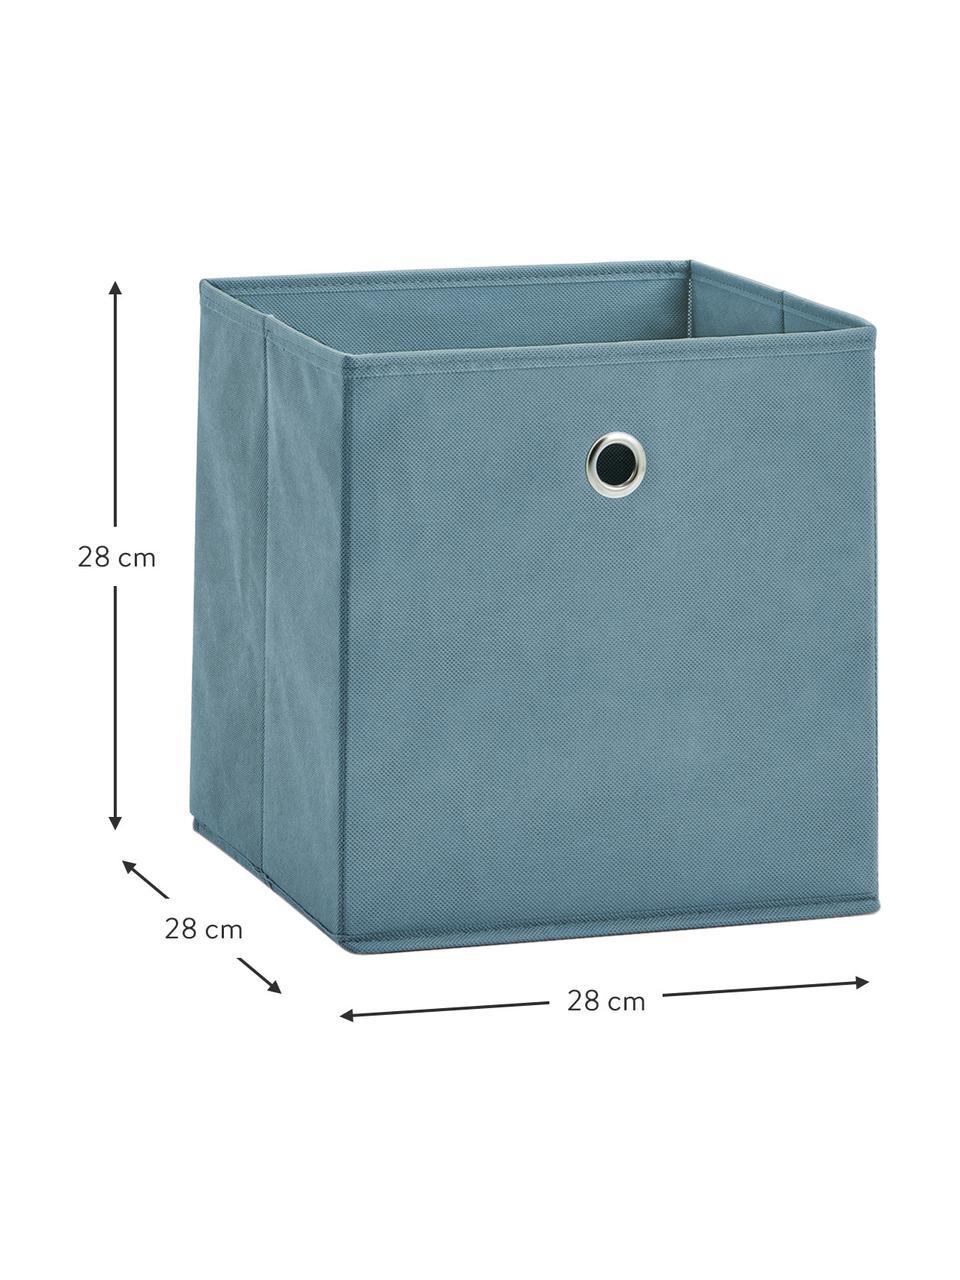 Scatola portaoggetti Lisa, Rivestimento: pile, Struttura: cartone, metallo, Blu, Larg. 28 x Alt. 28 cm